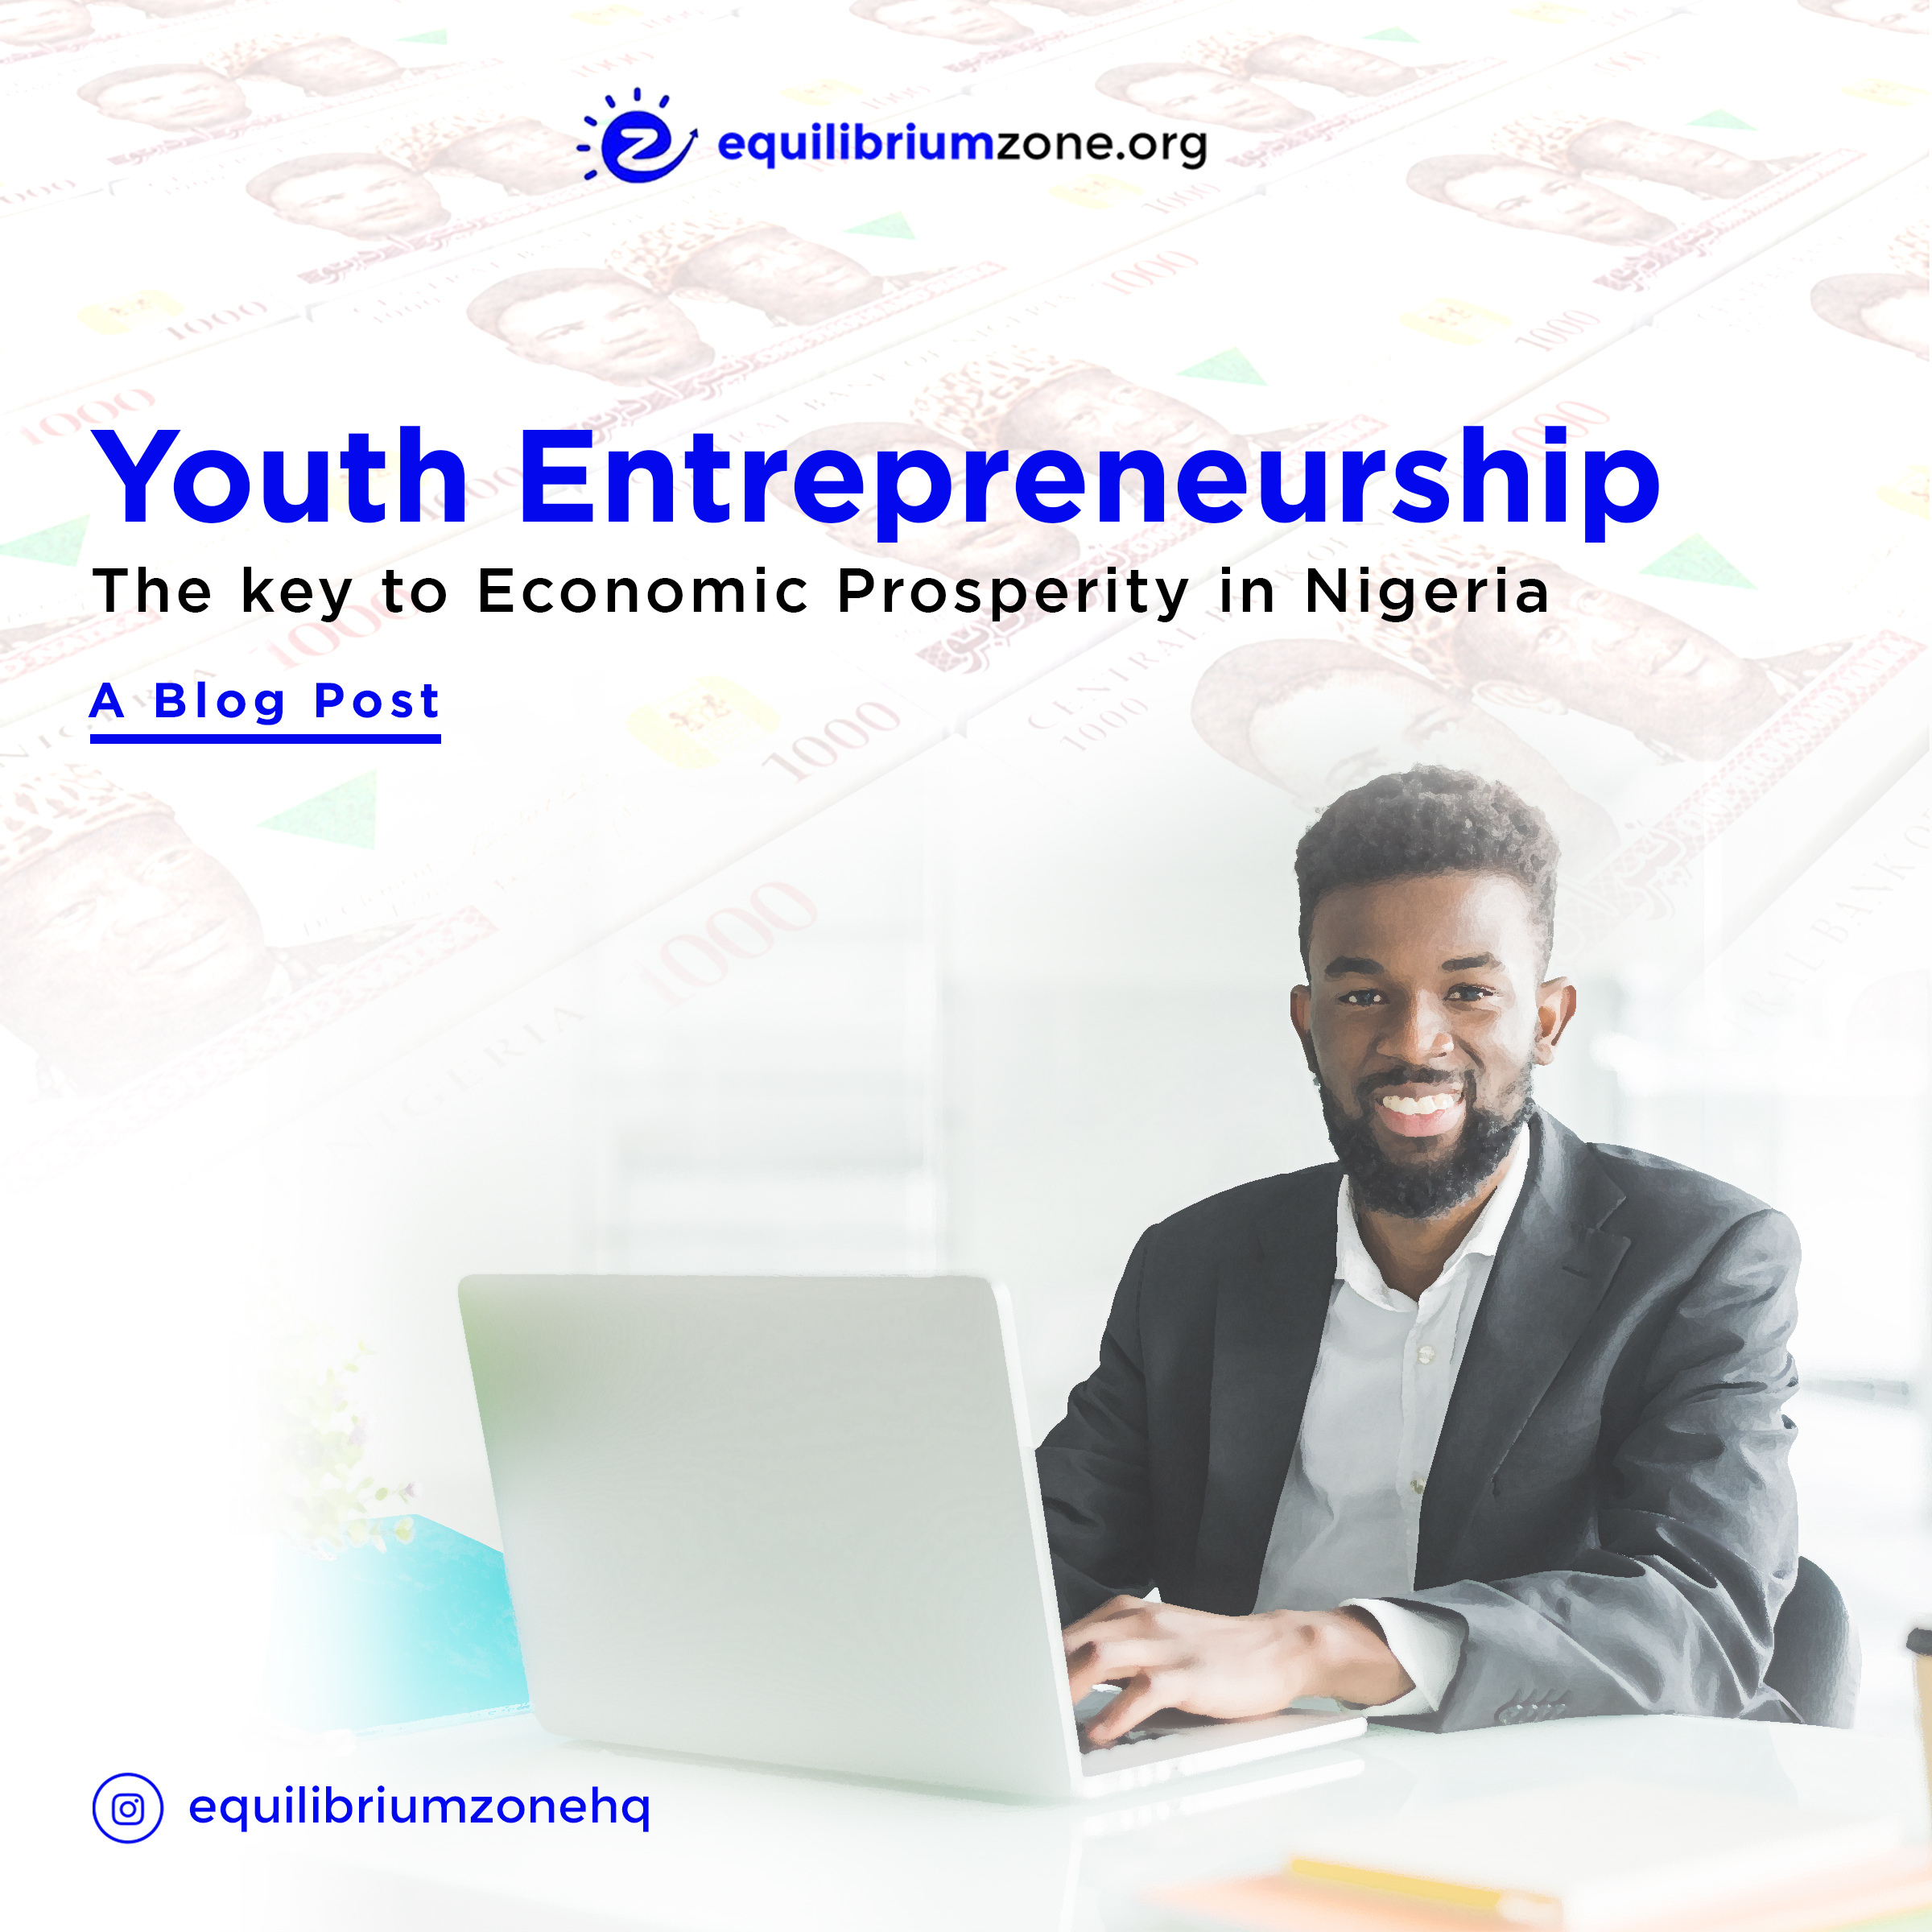 Youth Entrepreneurship: The Key to Economic Prosperity In Nigeria